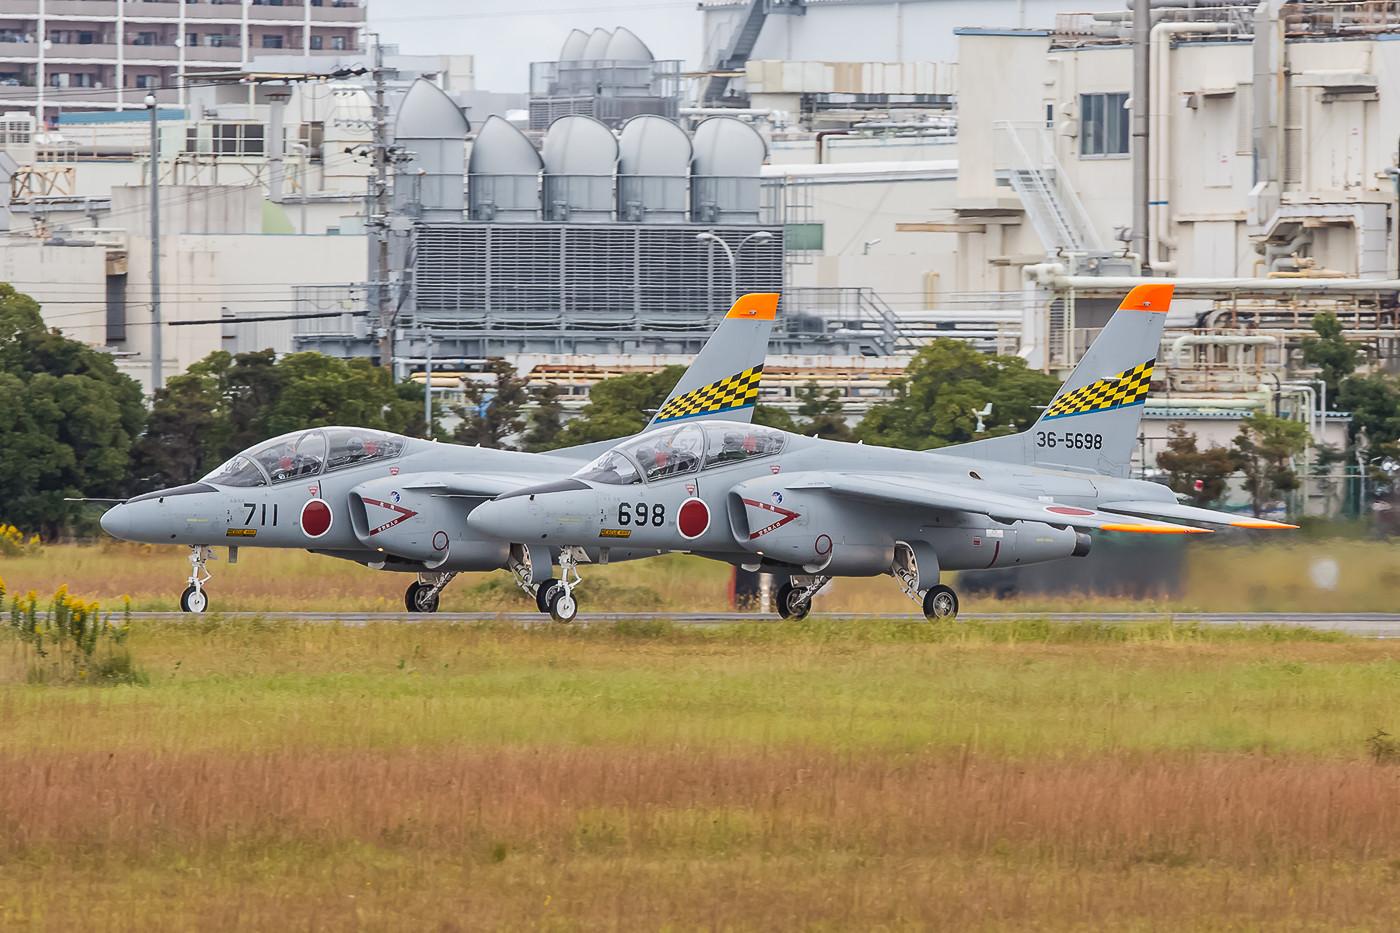 Zwei Kawasaki T-4 der 31st Kyoiku Hikotai beim Start.